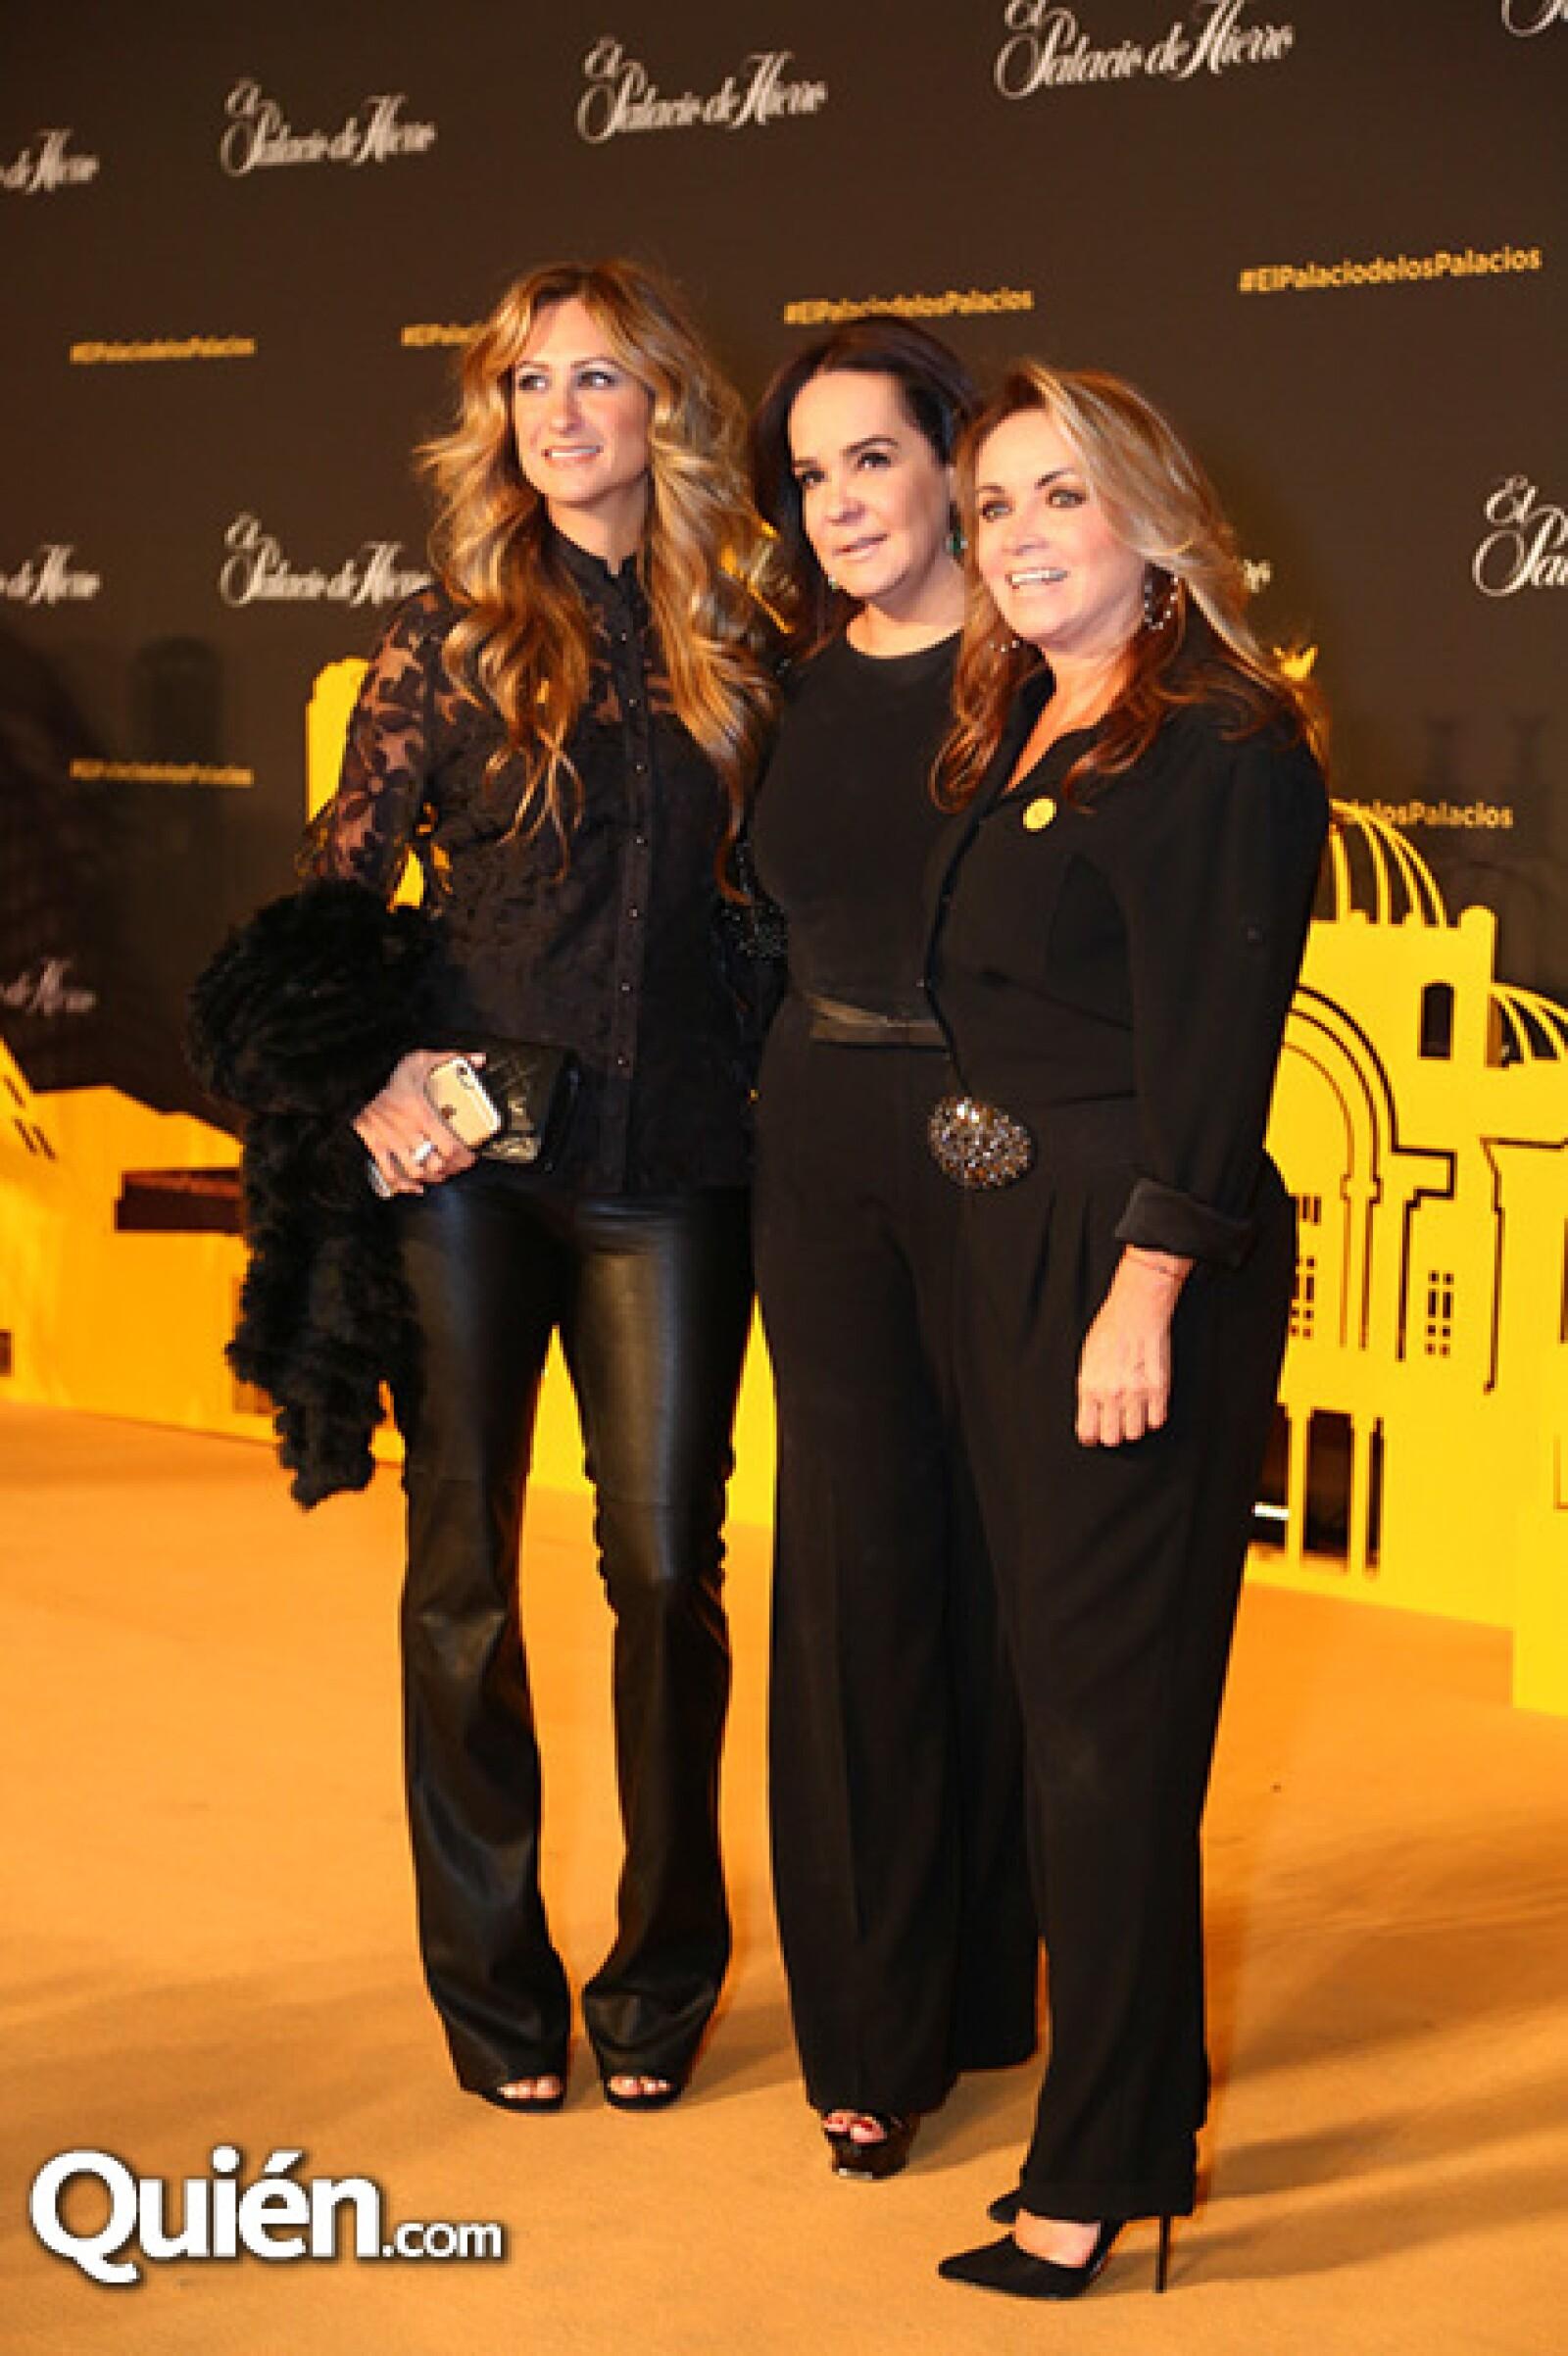 Pixie Deblyn,Margarita Pérez Cuellar y Rosaura Henkel